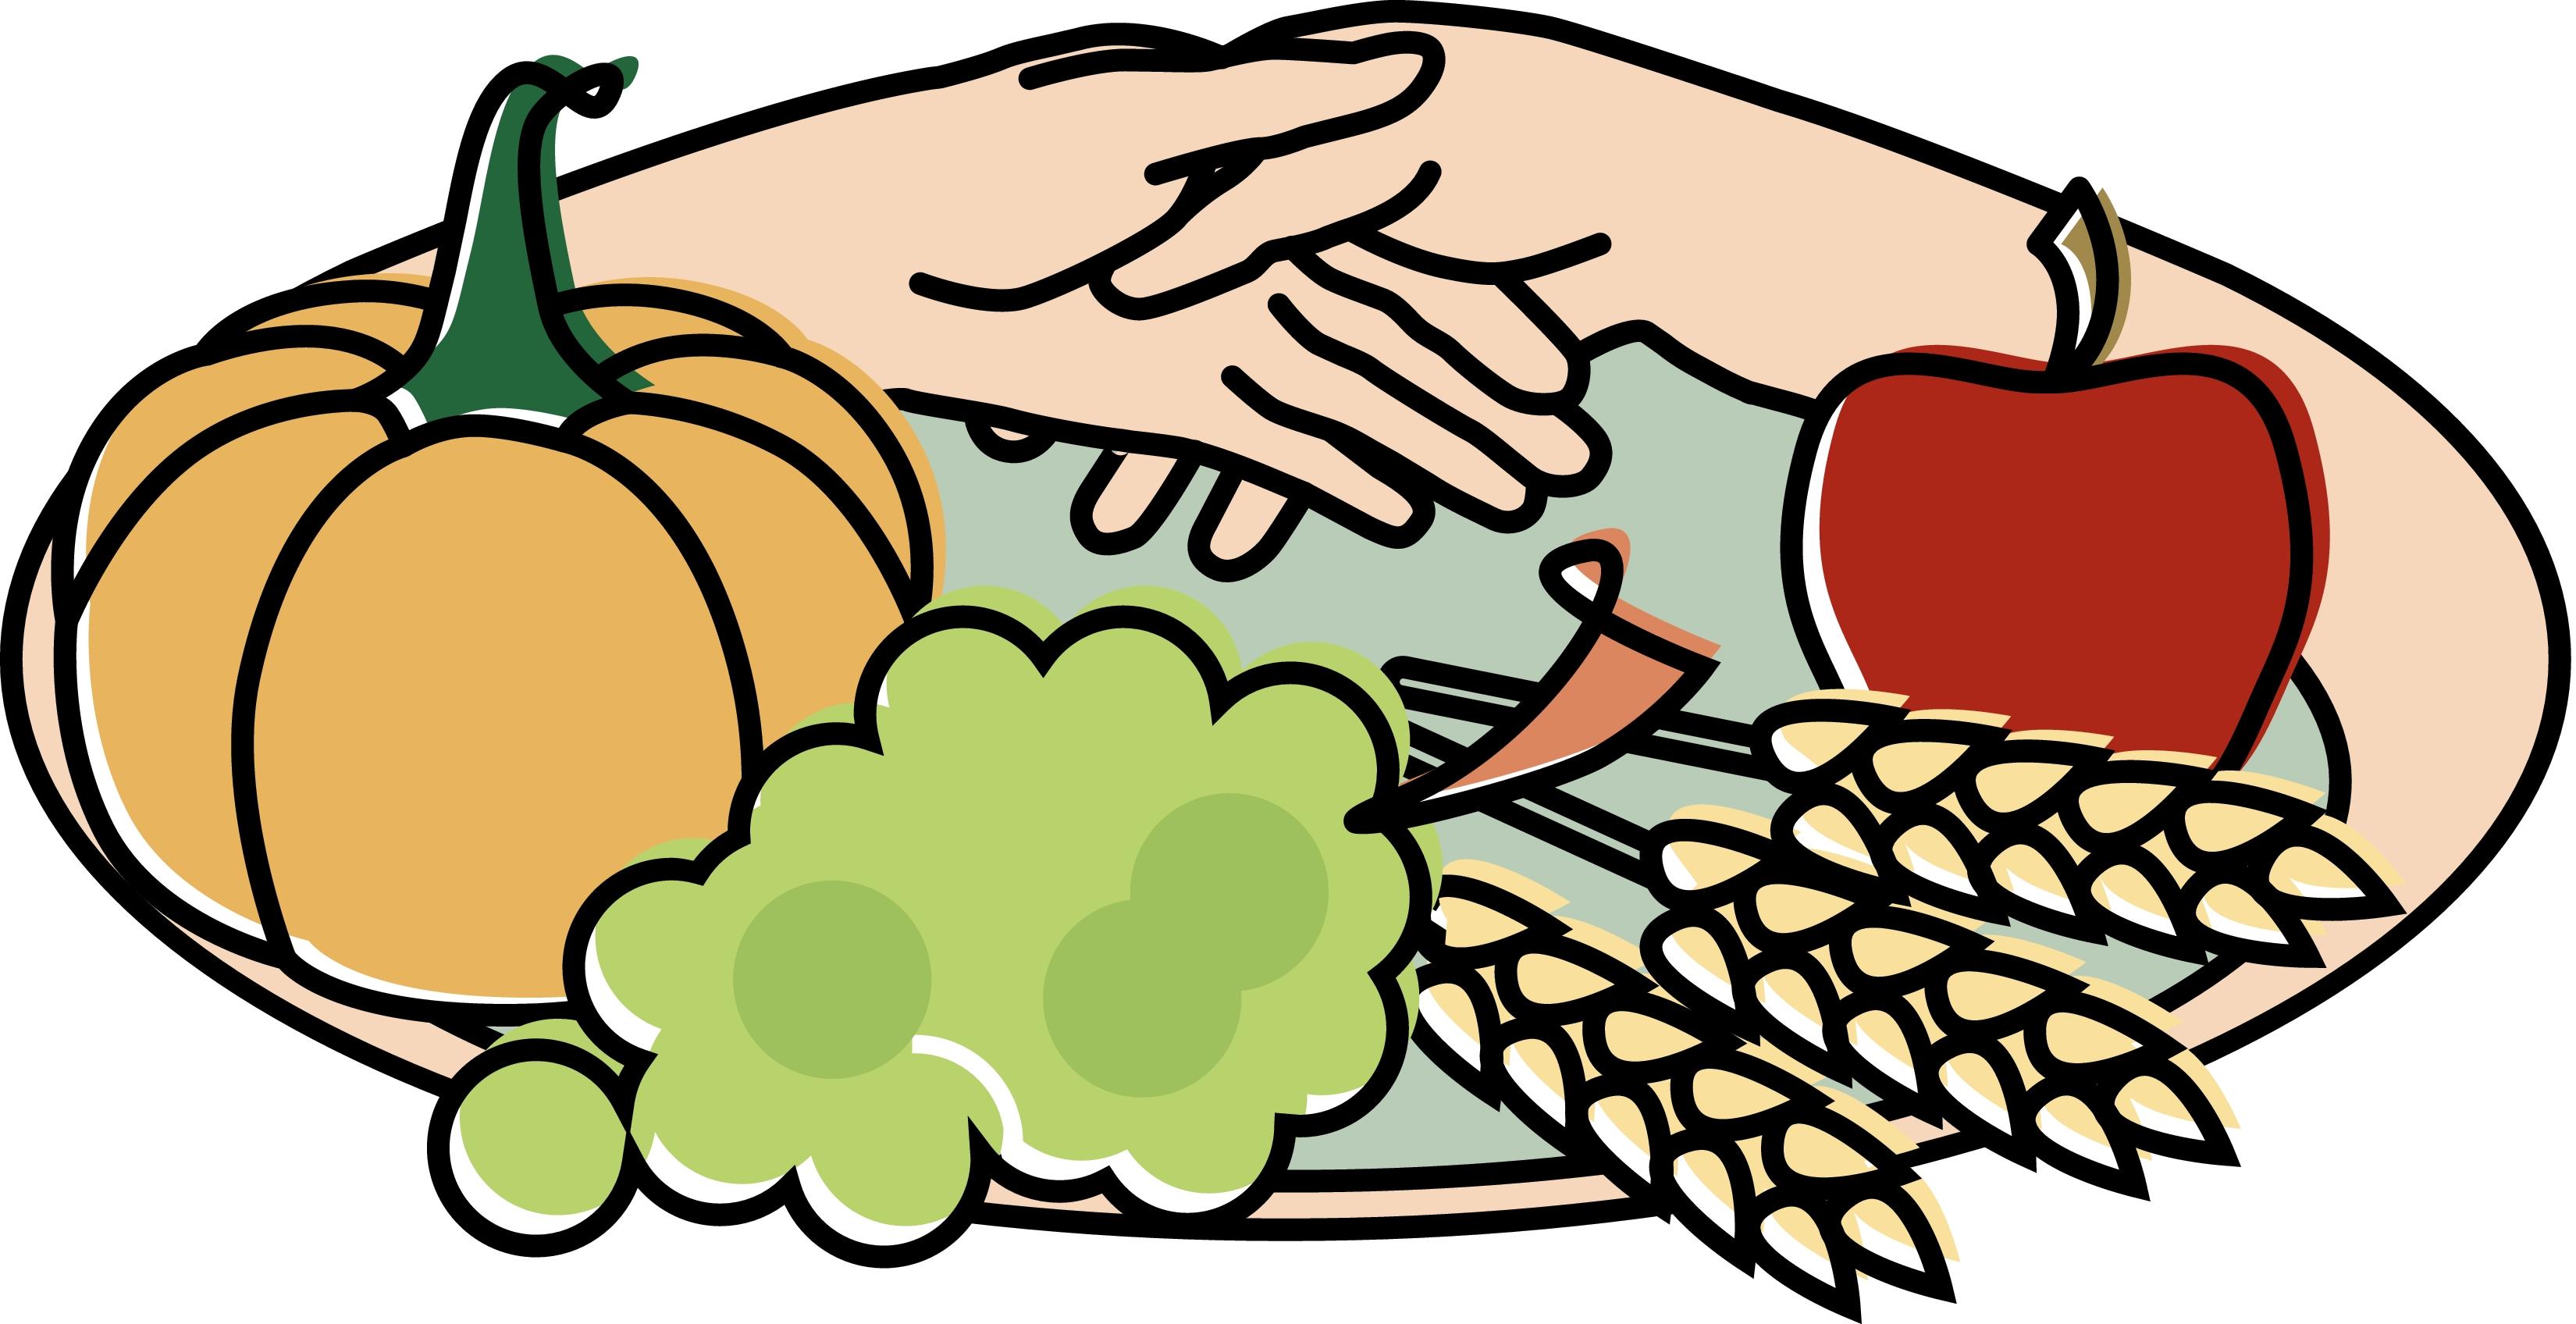 3300x1696 Lunch Clip Art Gerald Fast Food Dinner Ff Menu 6 9px